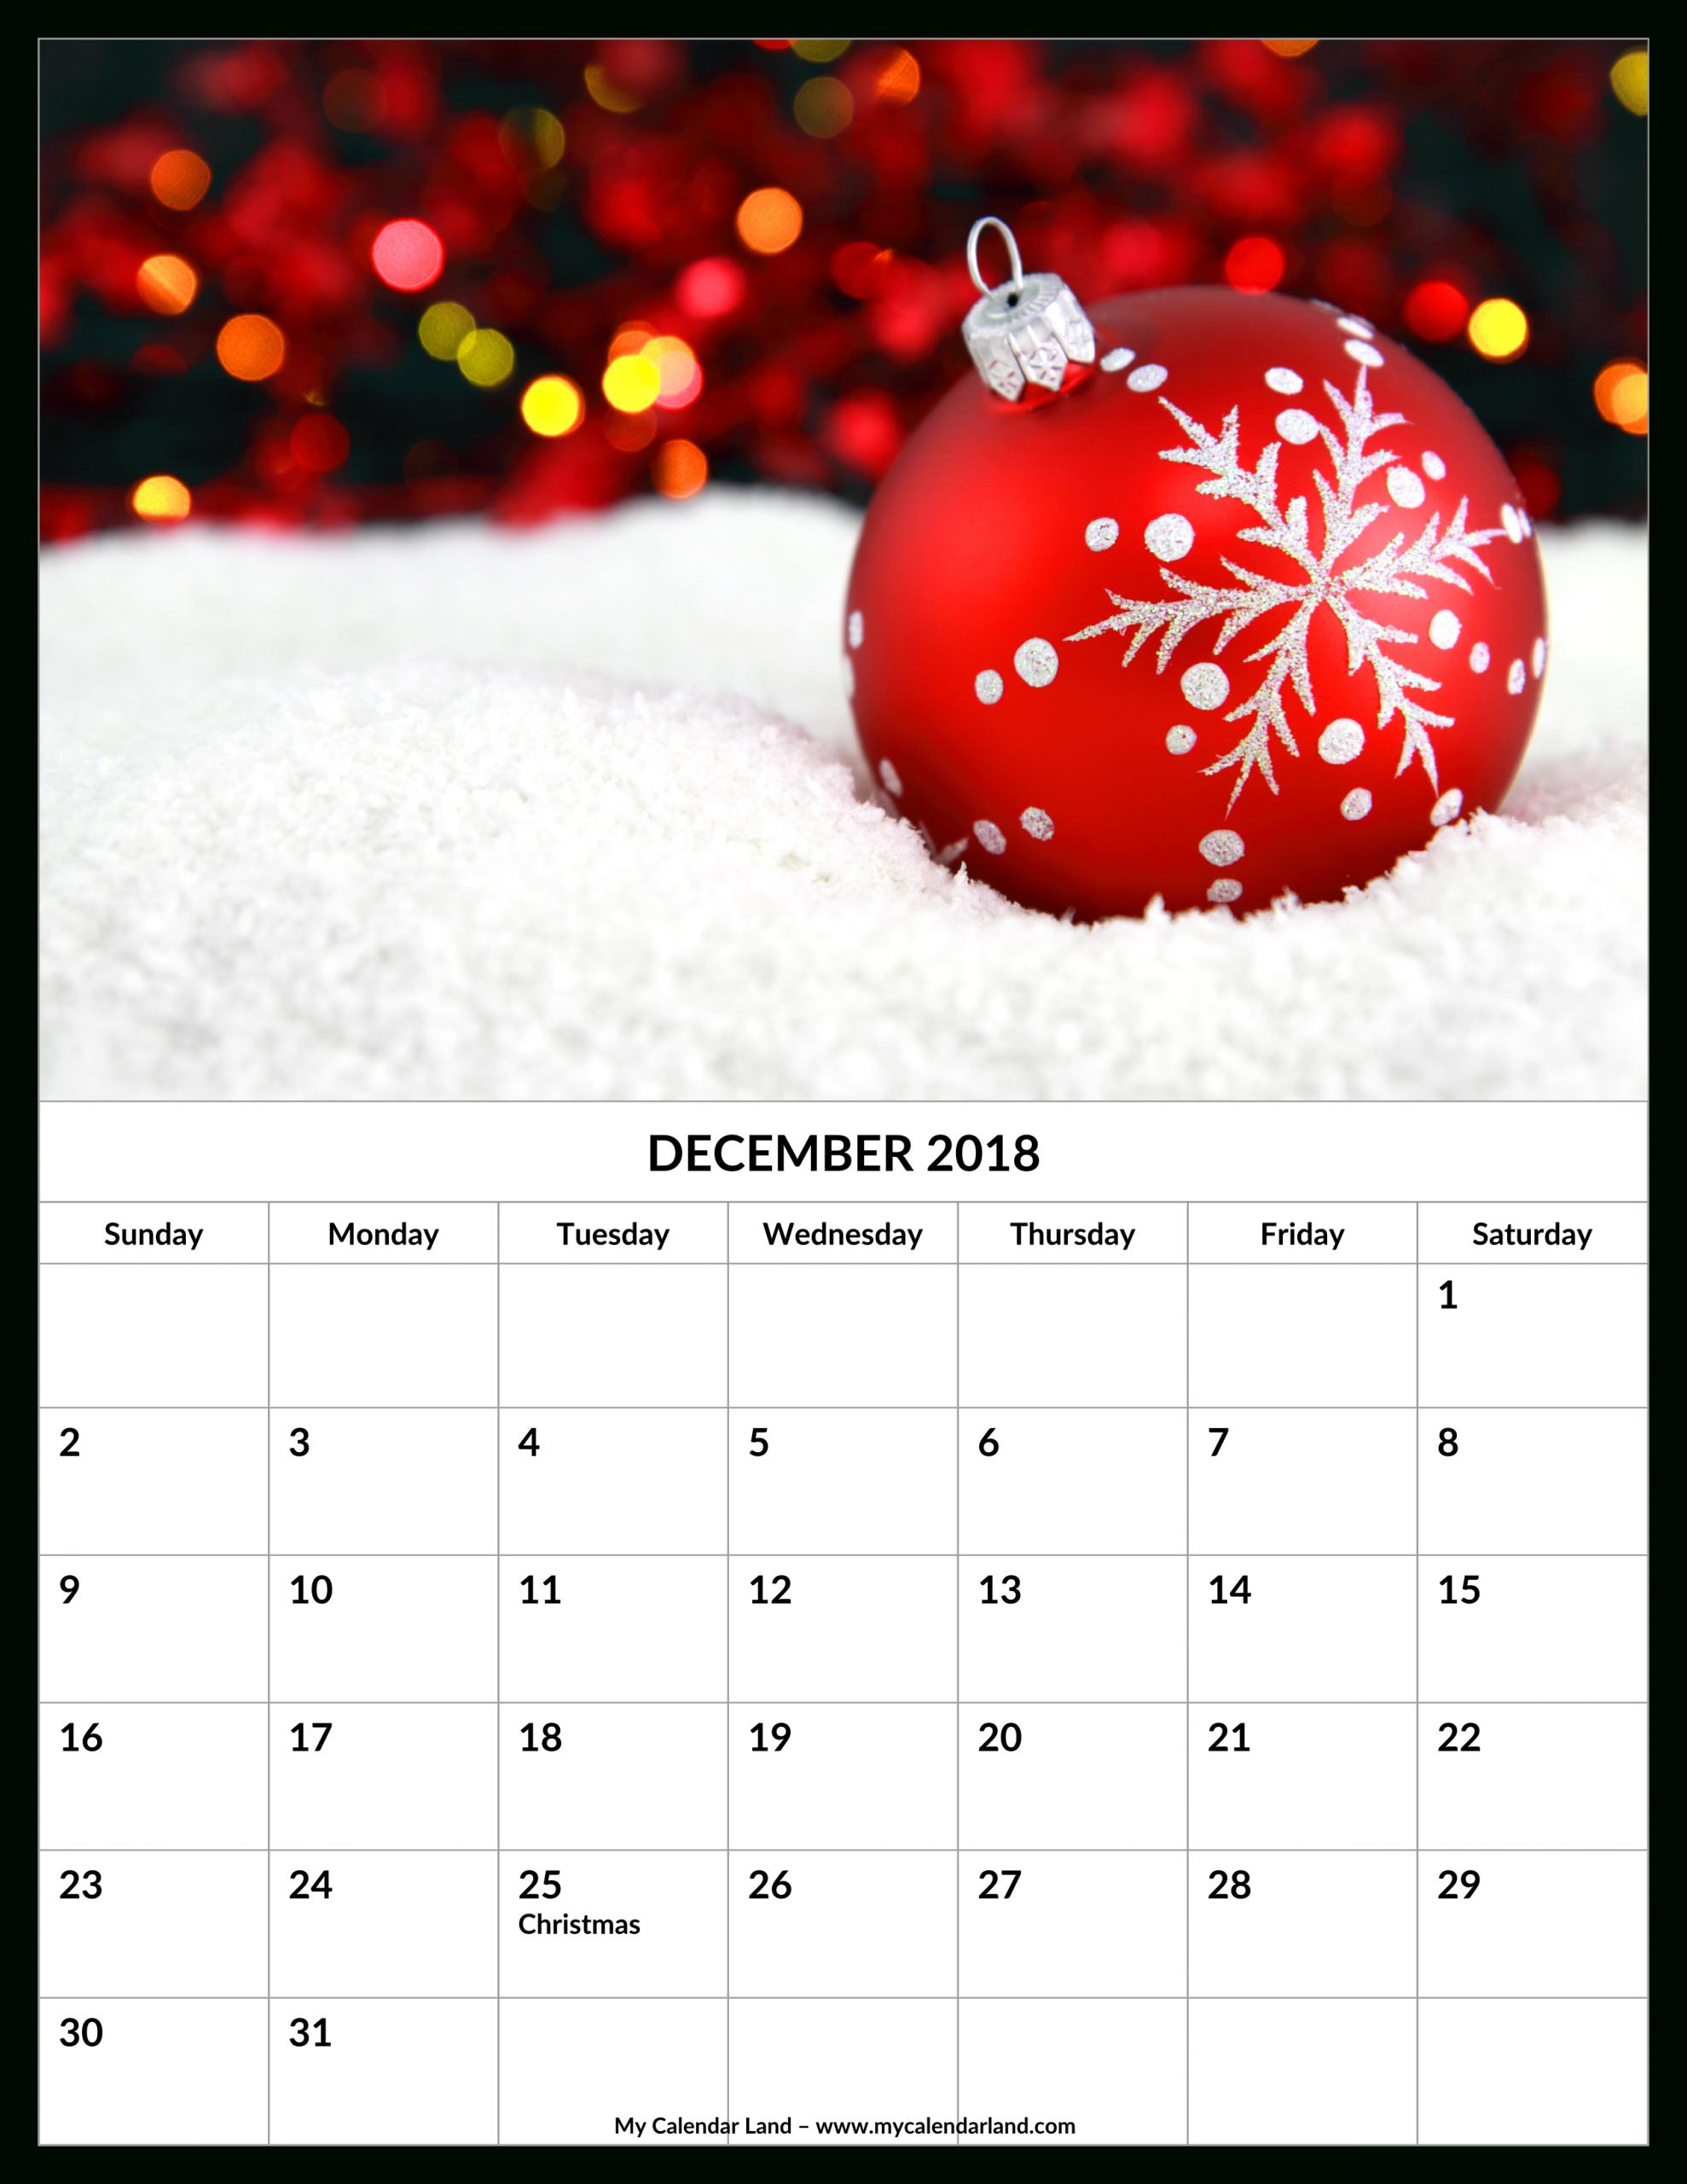 December 2018 Calendar My Calendar Land